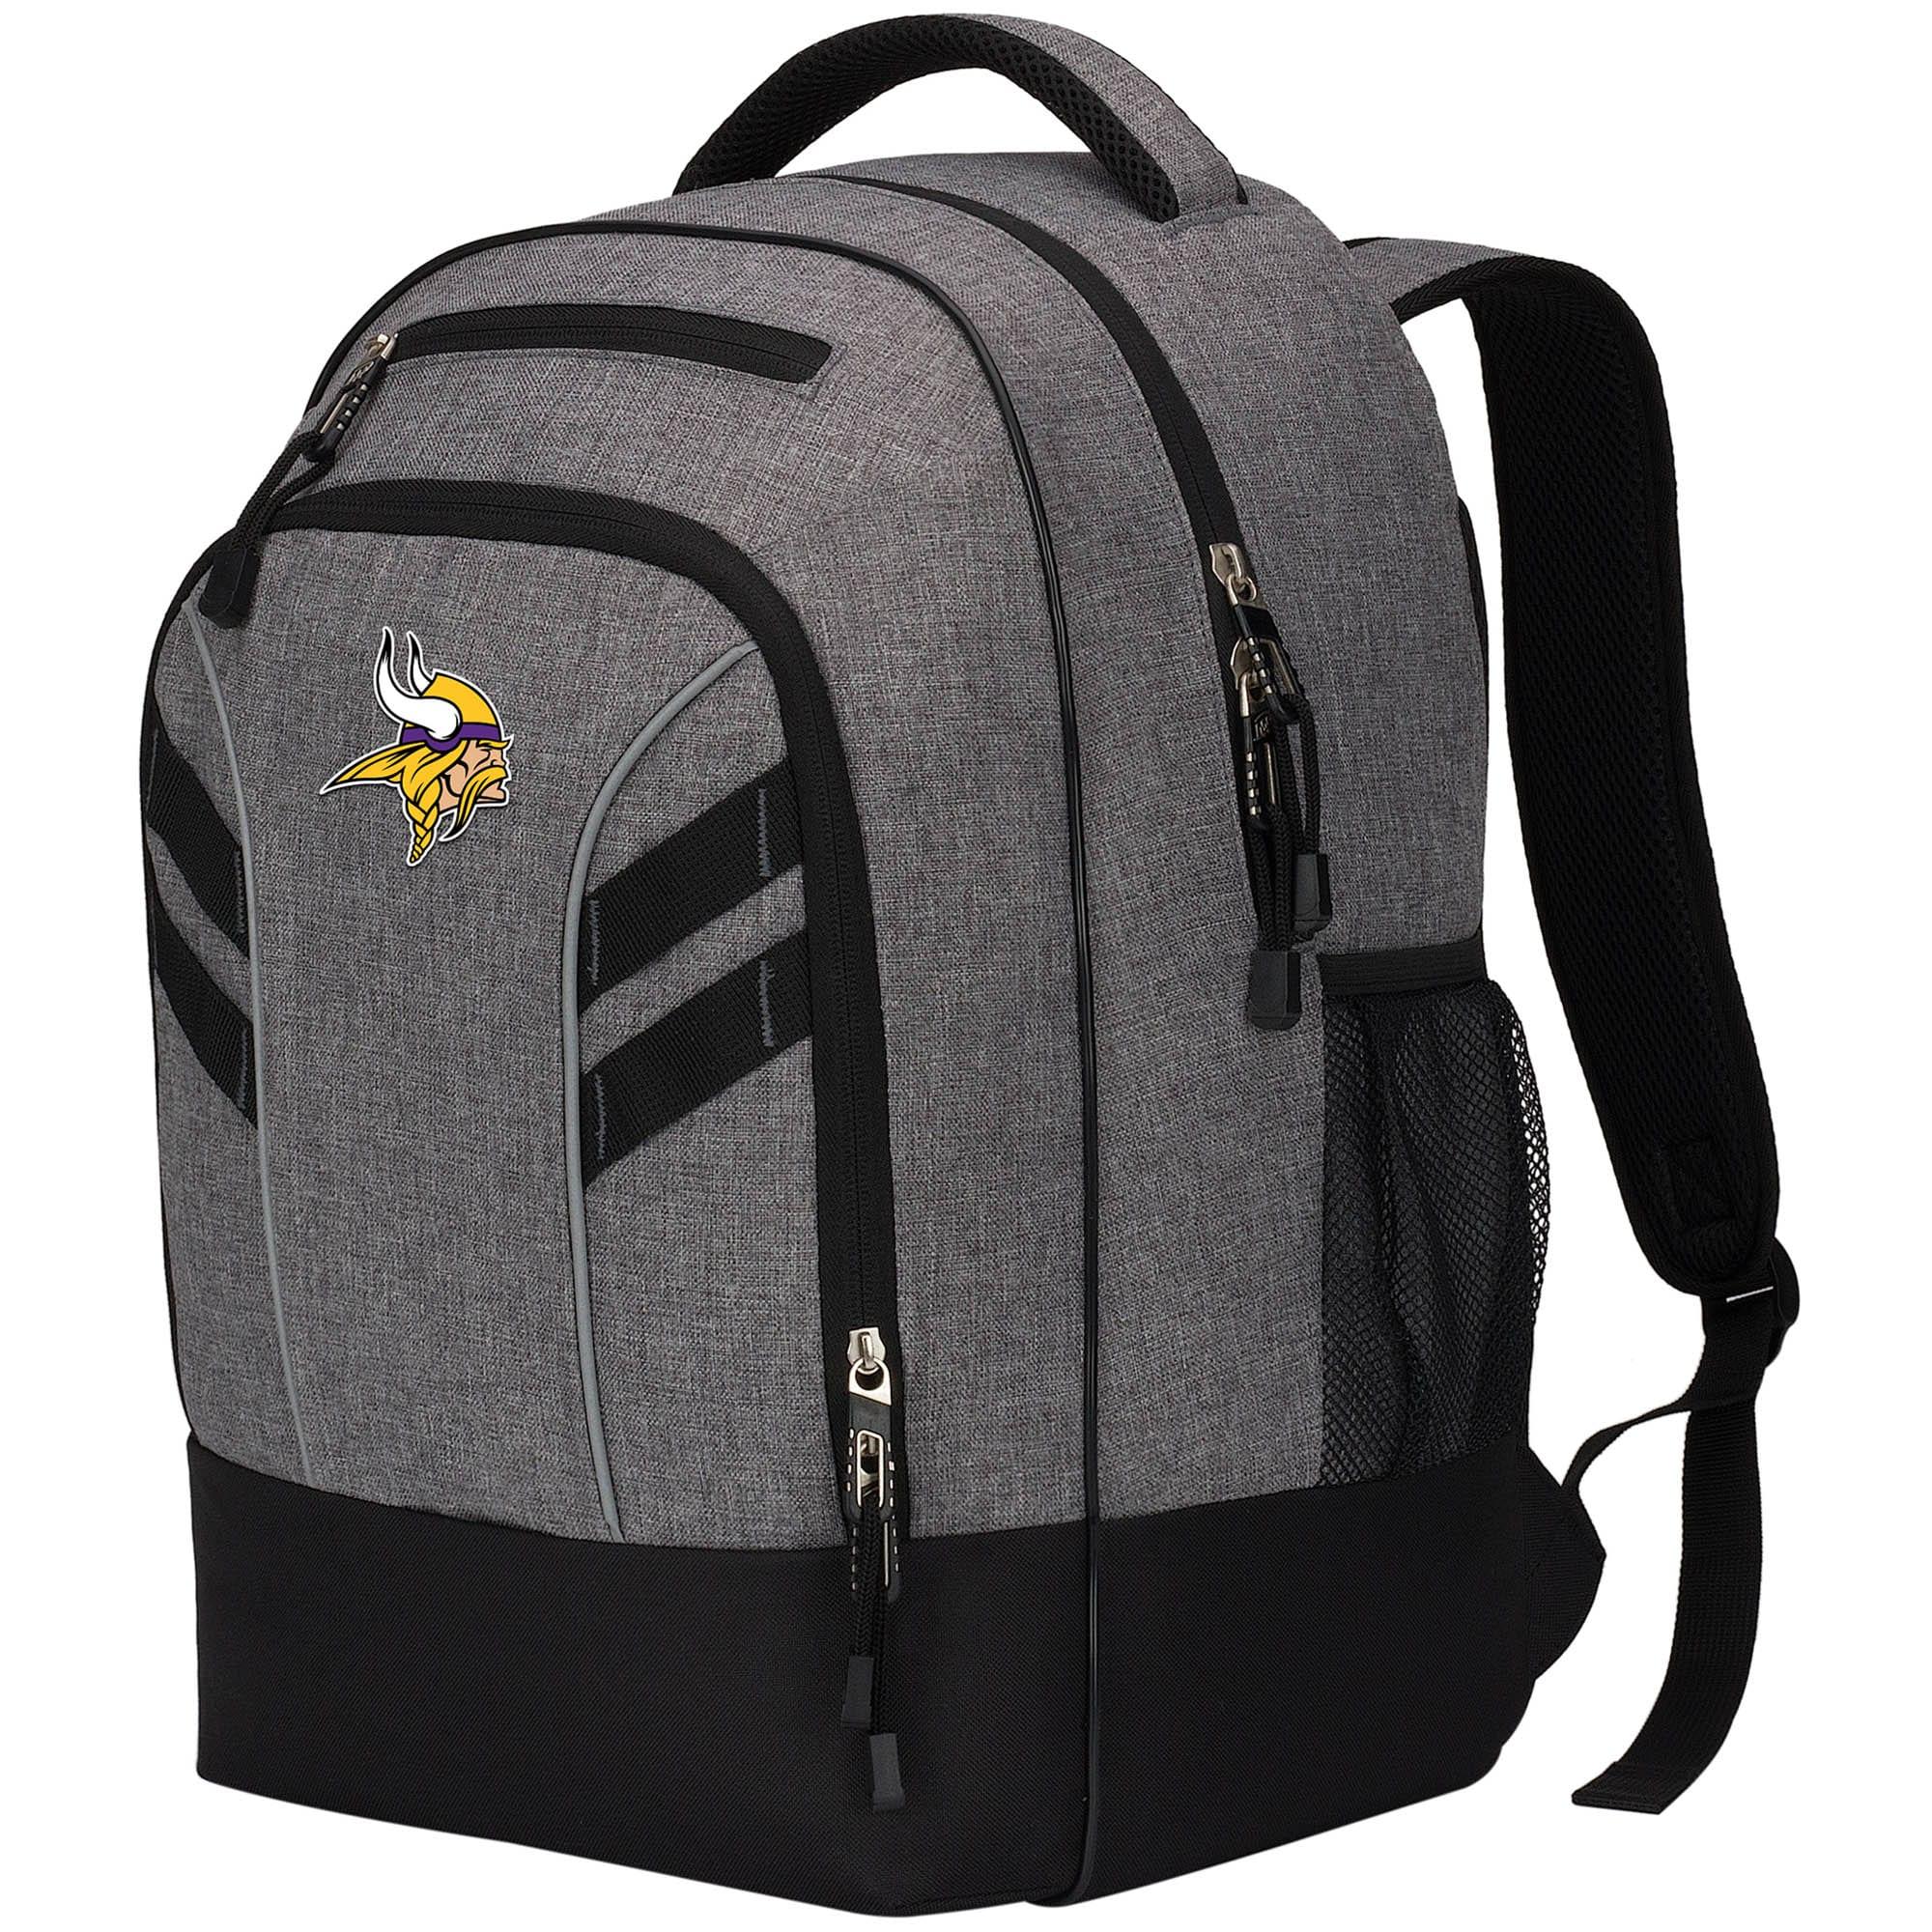 Minnesota Vikings The Northwest Company Razor Backpack